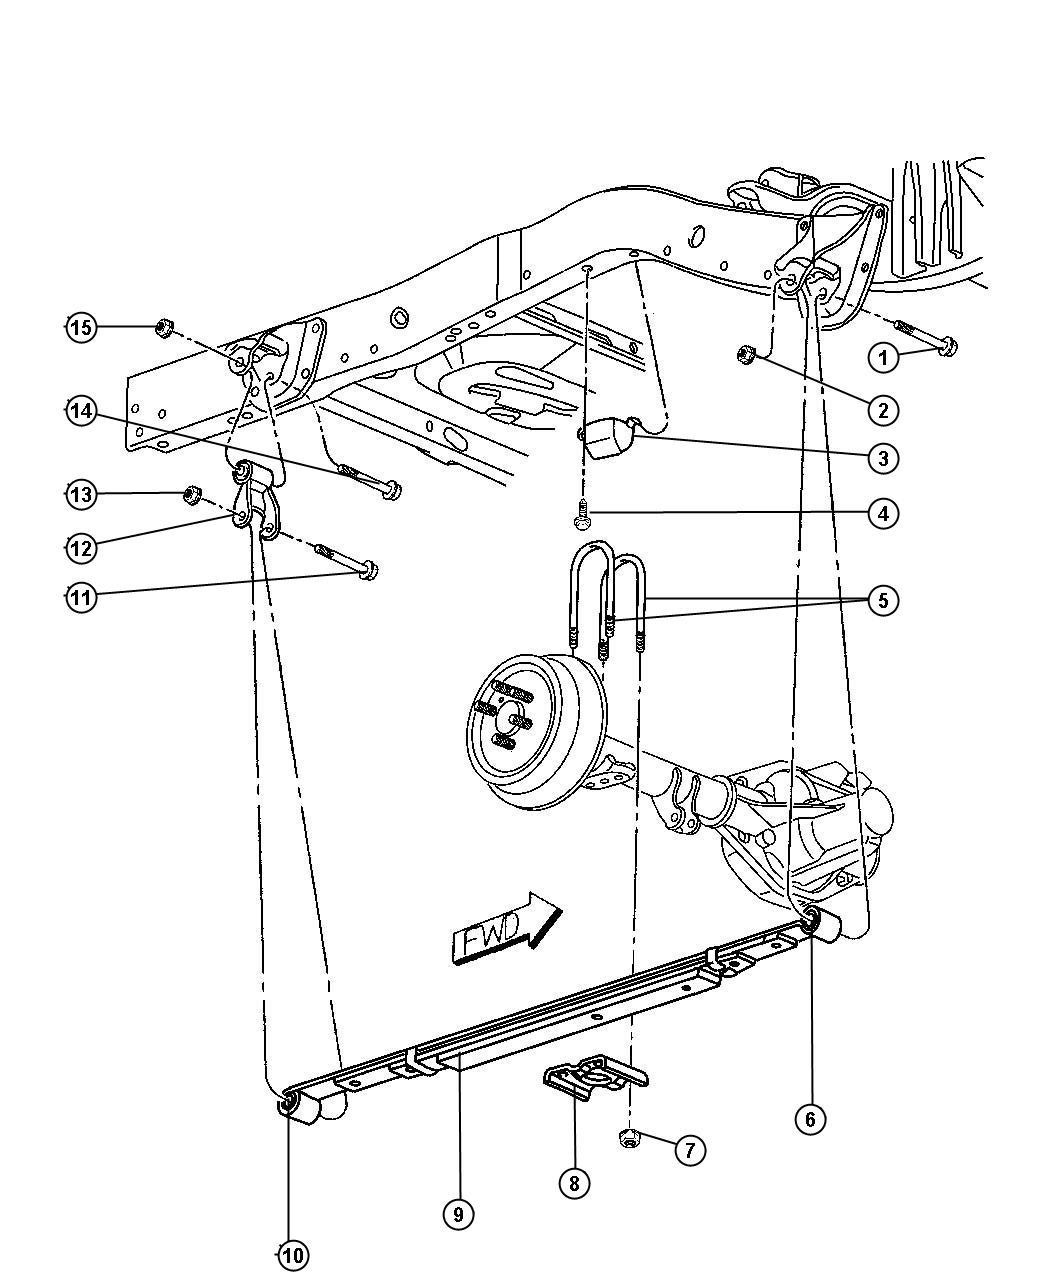 1997 Dodge Dakota 56021624 Parts Diagram. Dodge. Auto